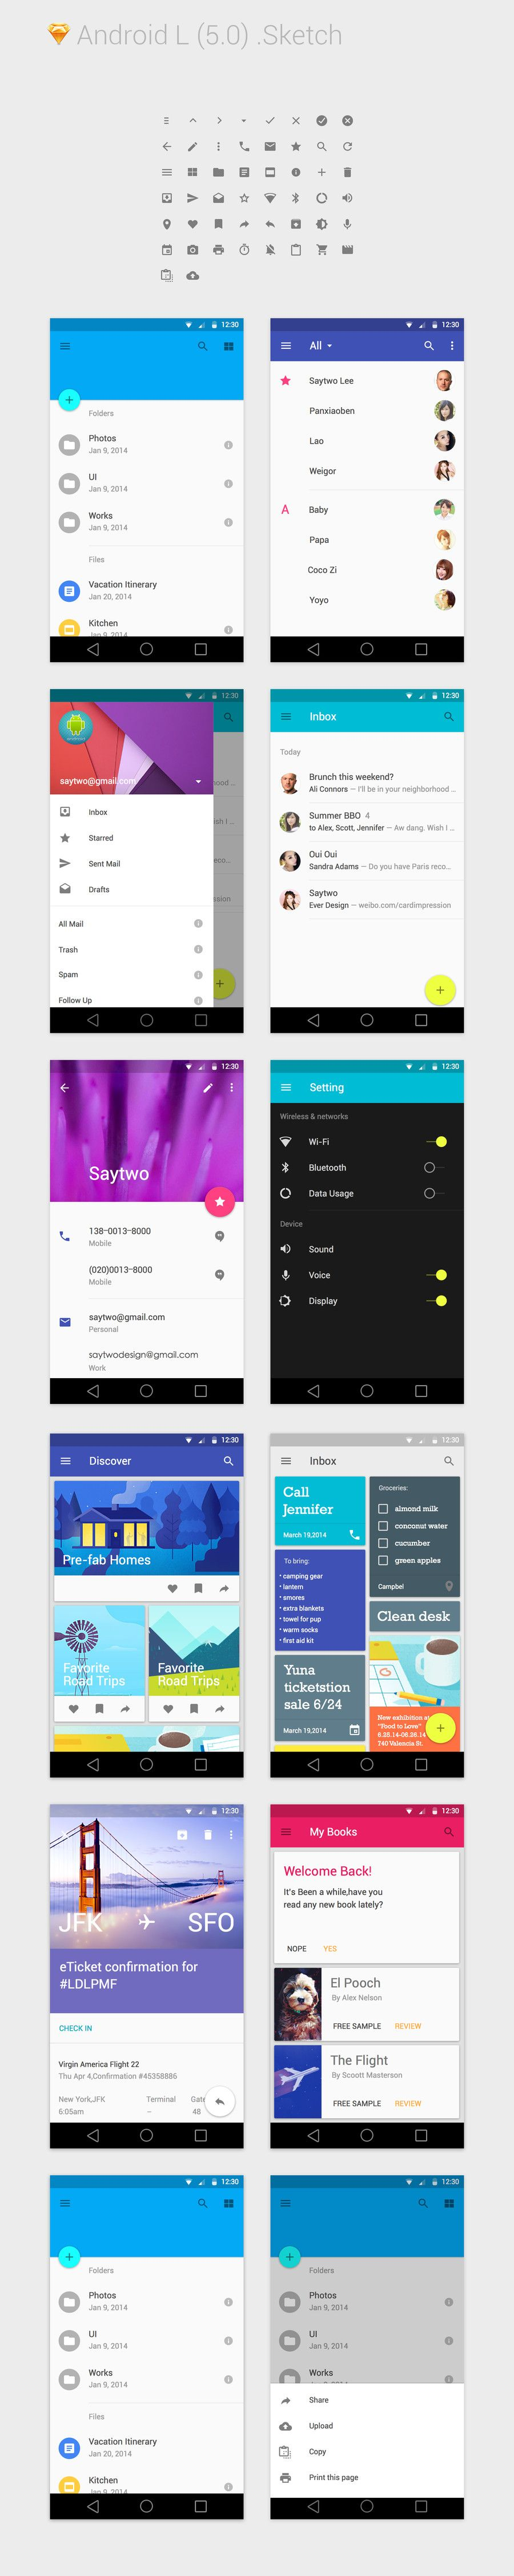 Android L For Sketch 3 Materialdesign Material Design Design